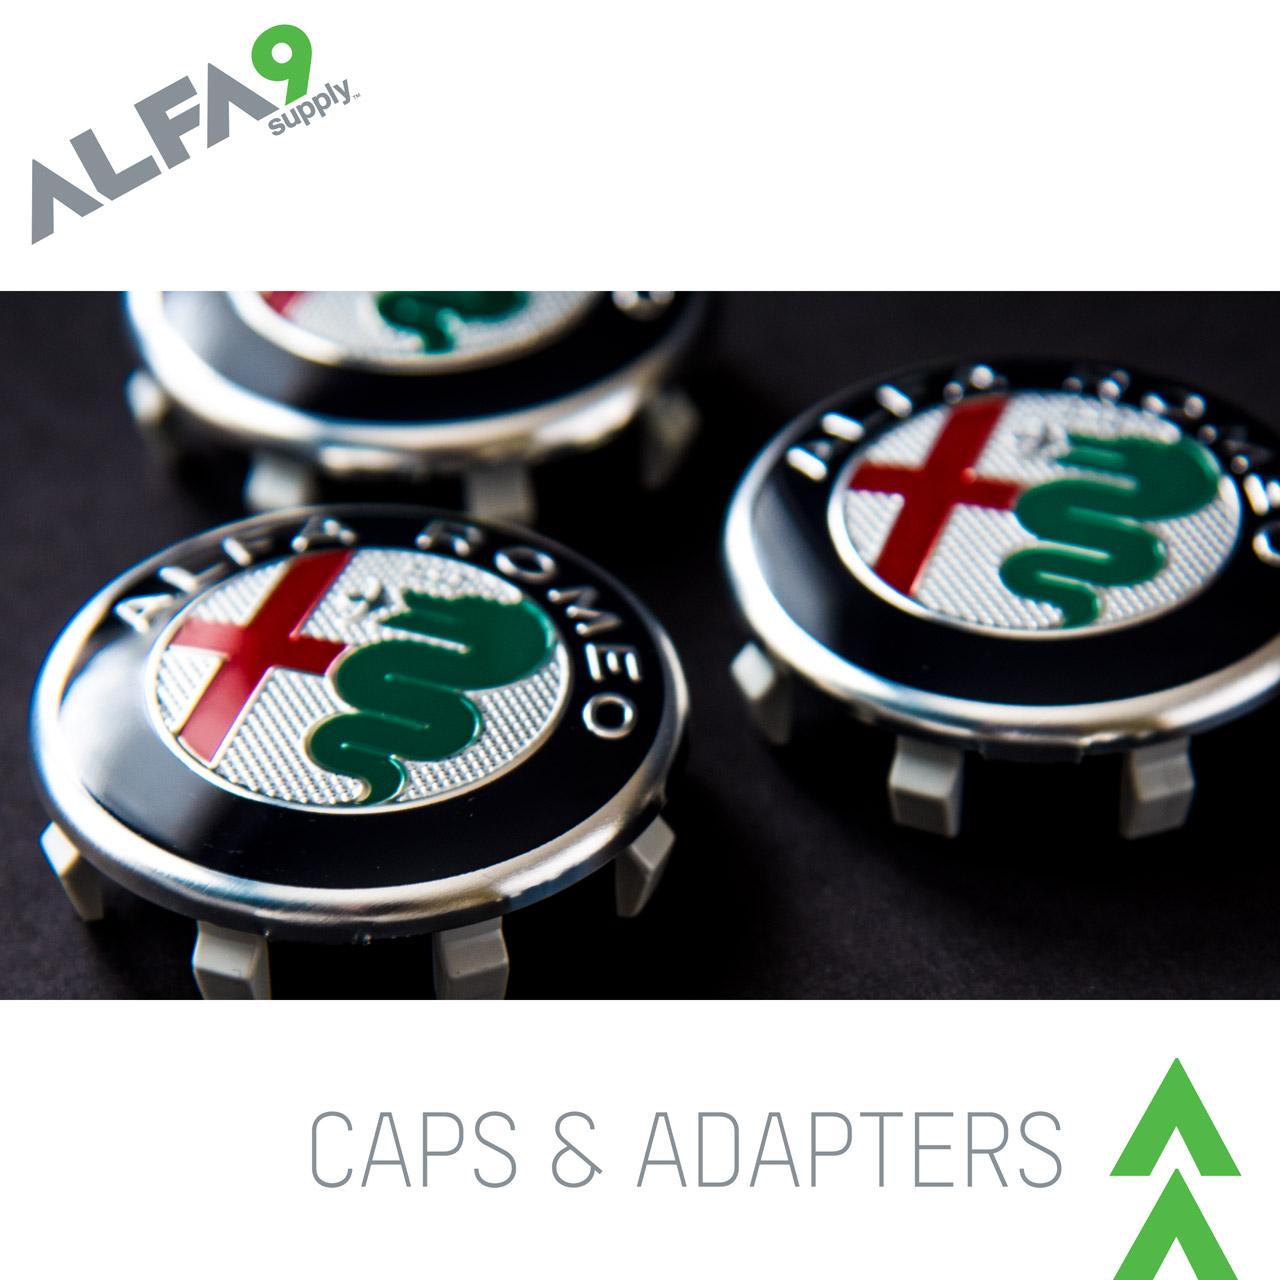 www.alfa9supply.com